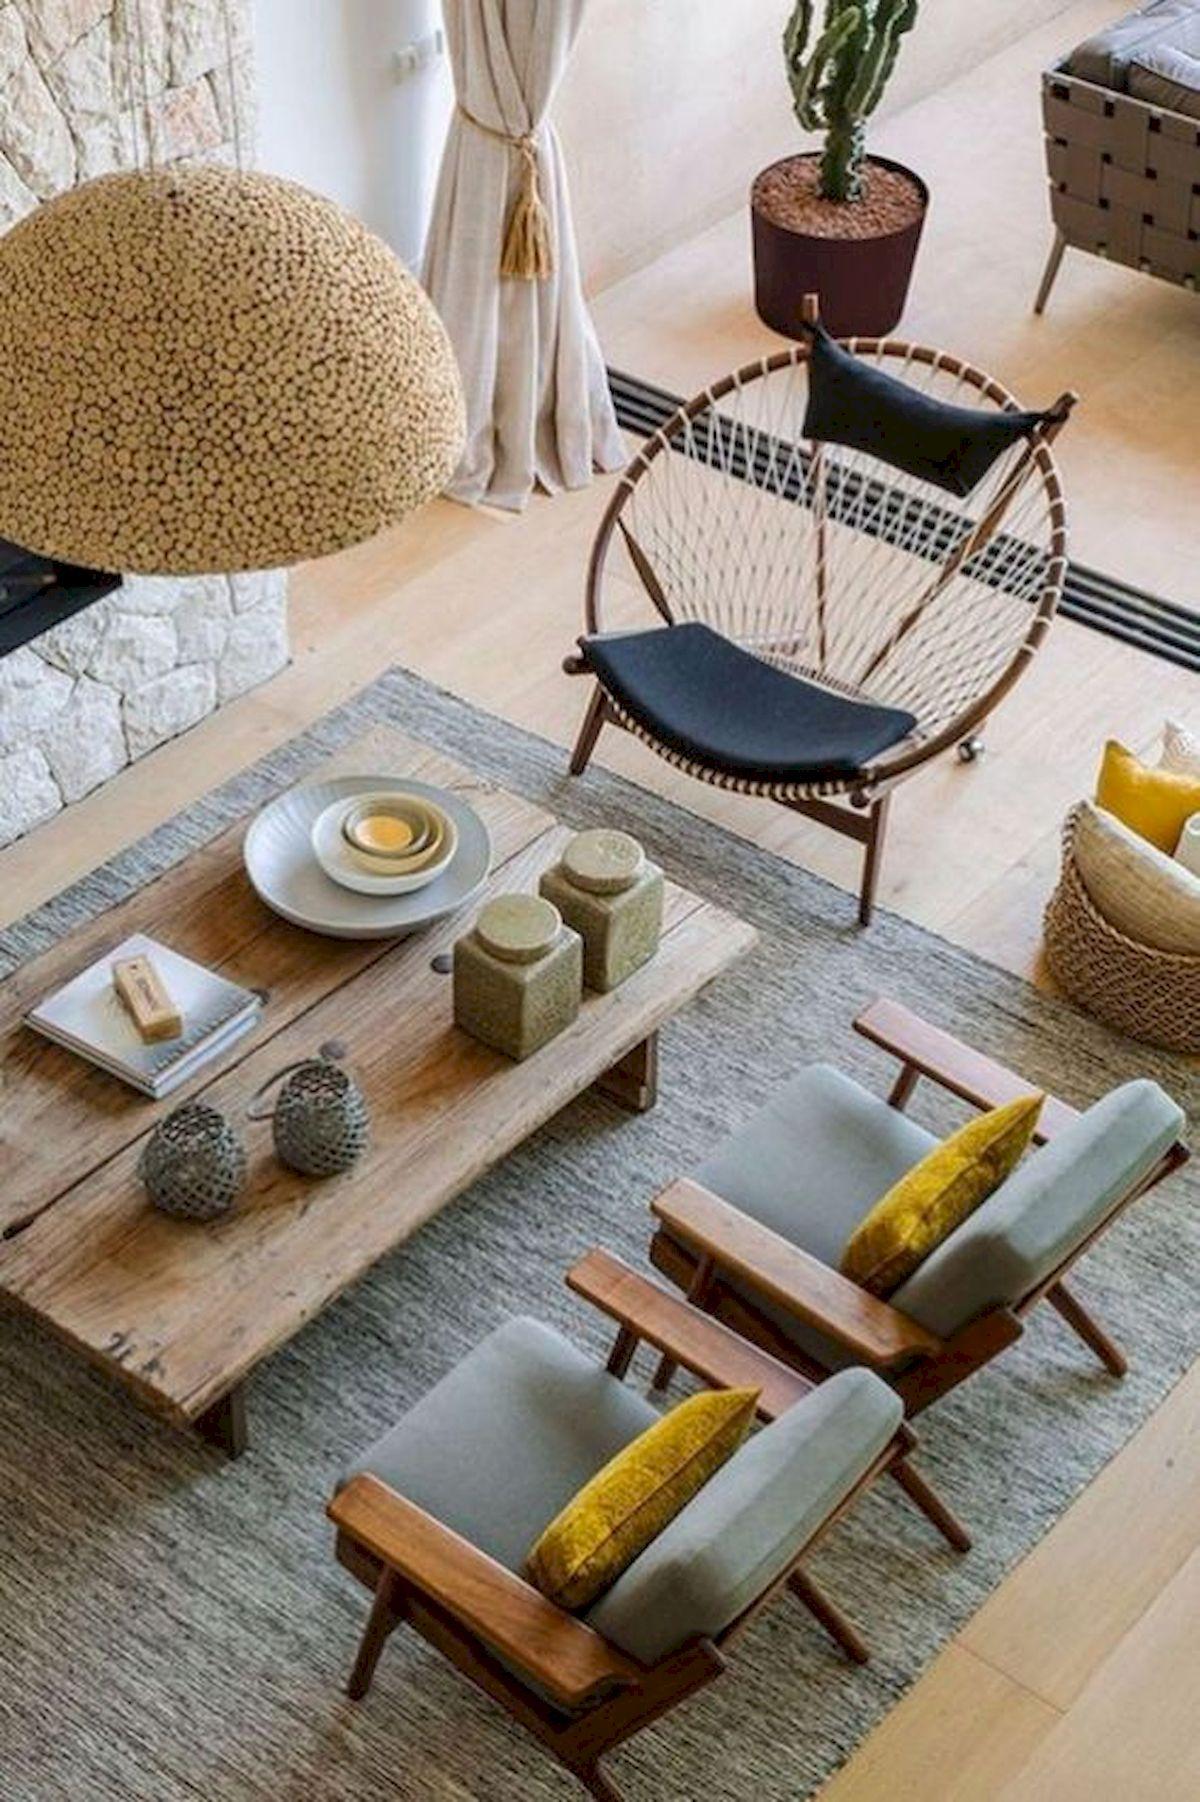 35 Stunning Scandinavian Interior Design and Decor Ideas (22)